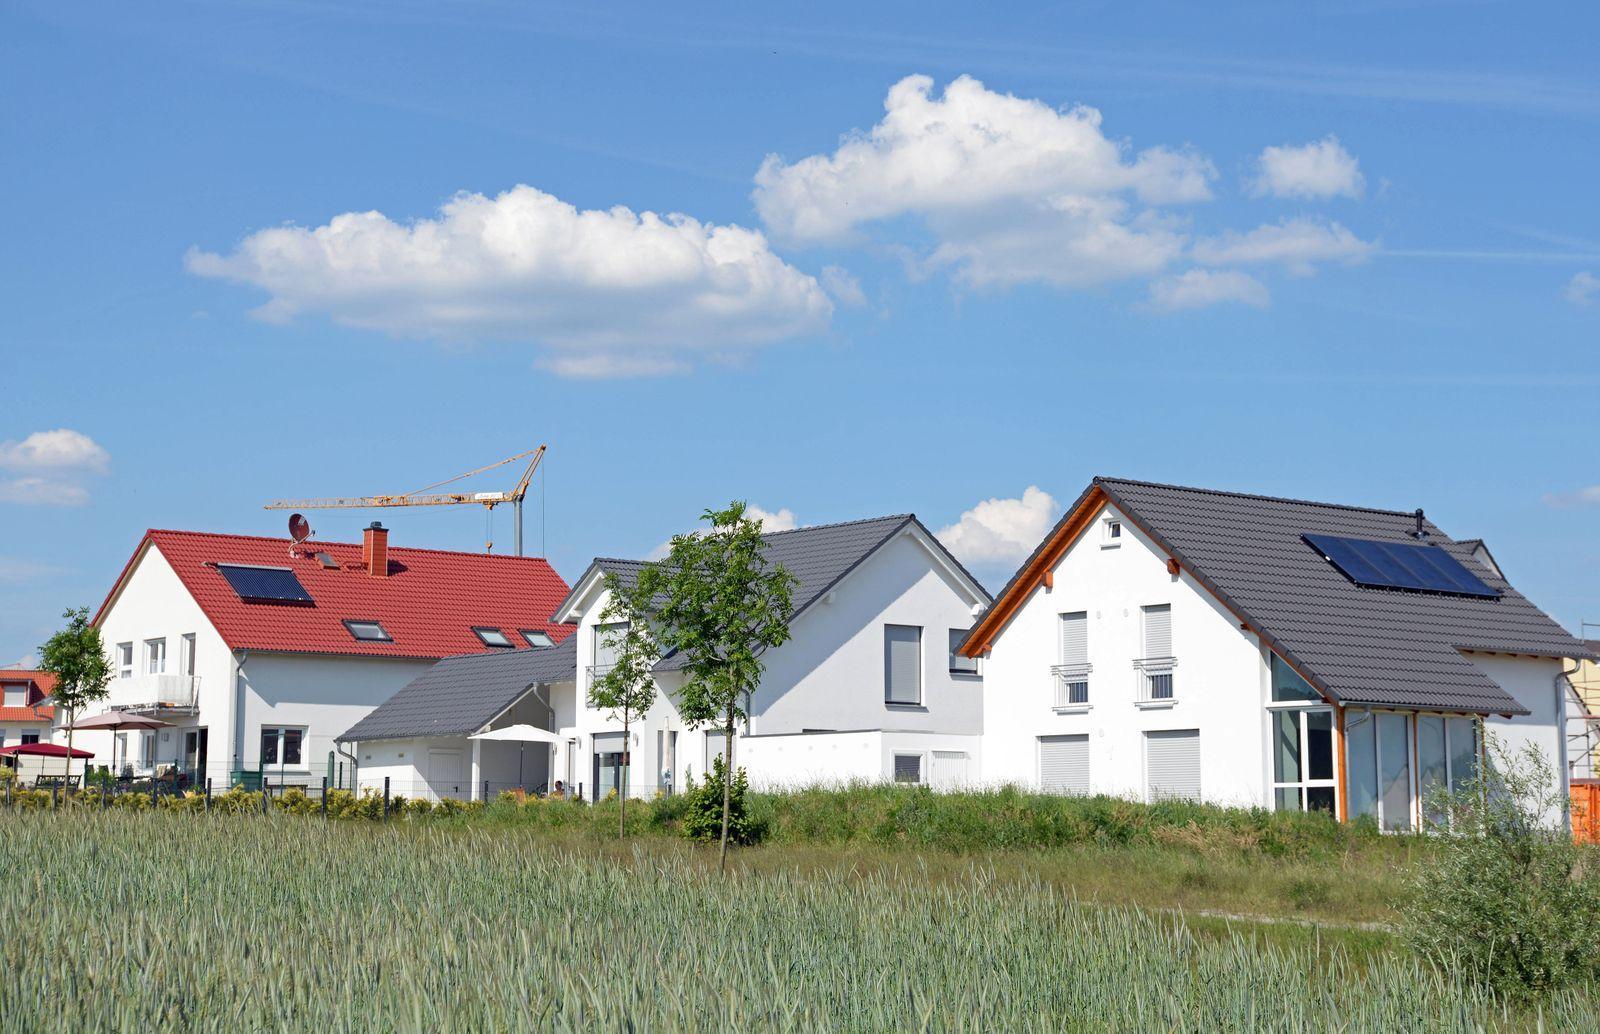 einfamilienhaus,wohngebiet *** detached house,residential area gwr-n6q